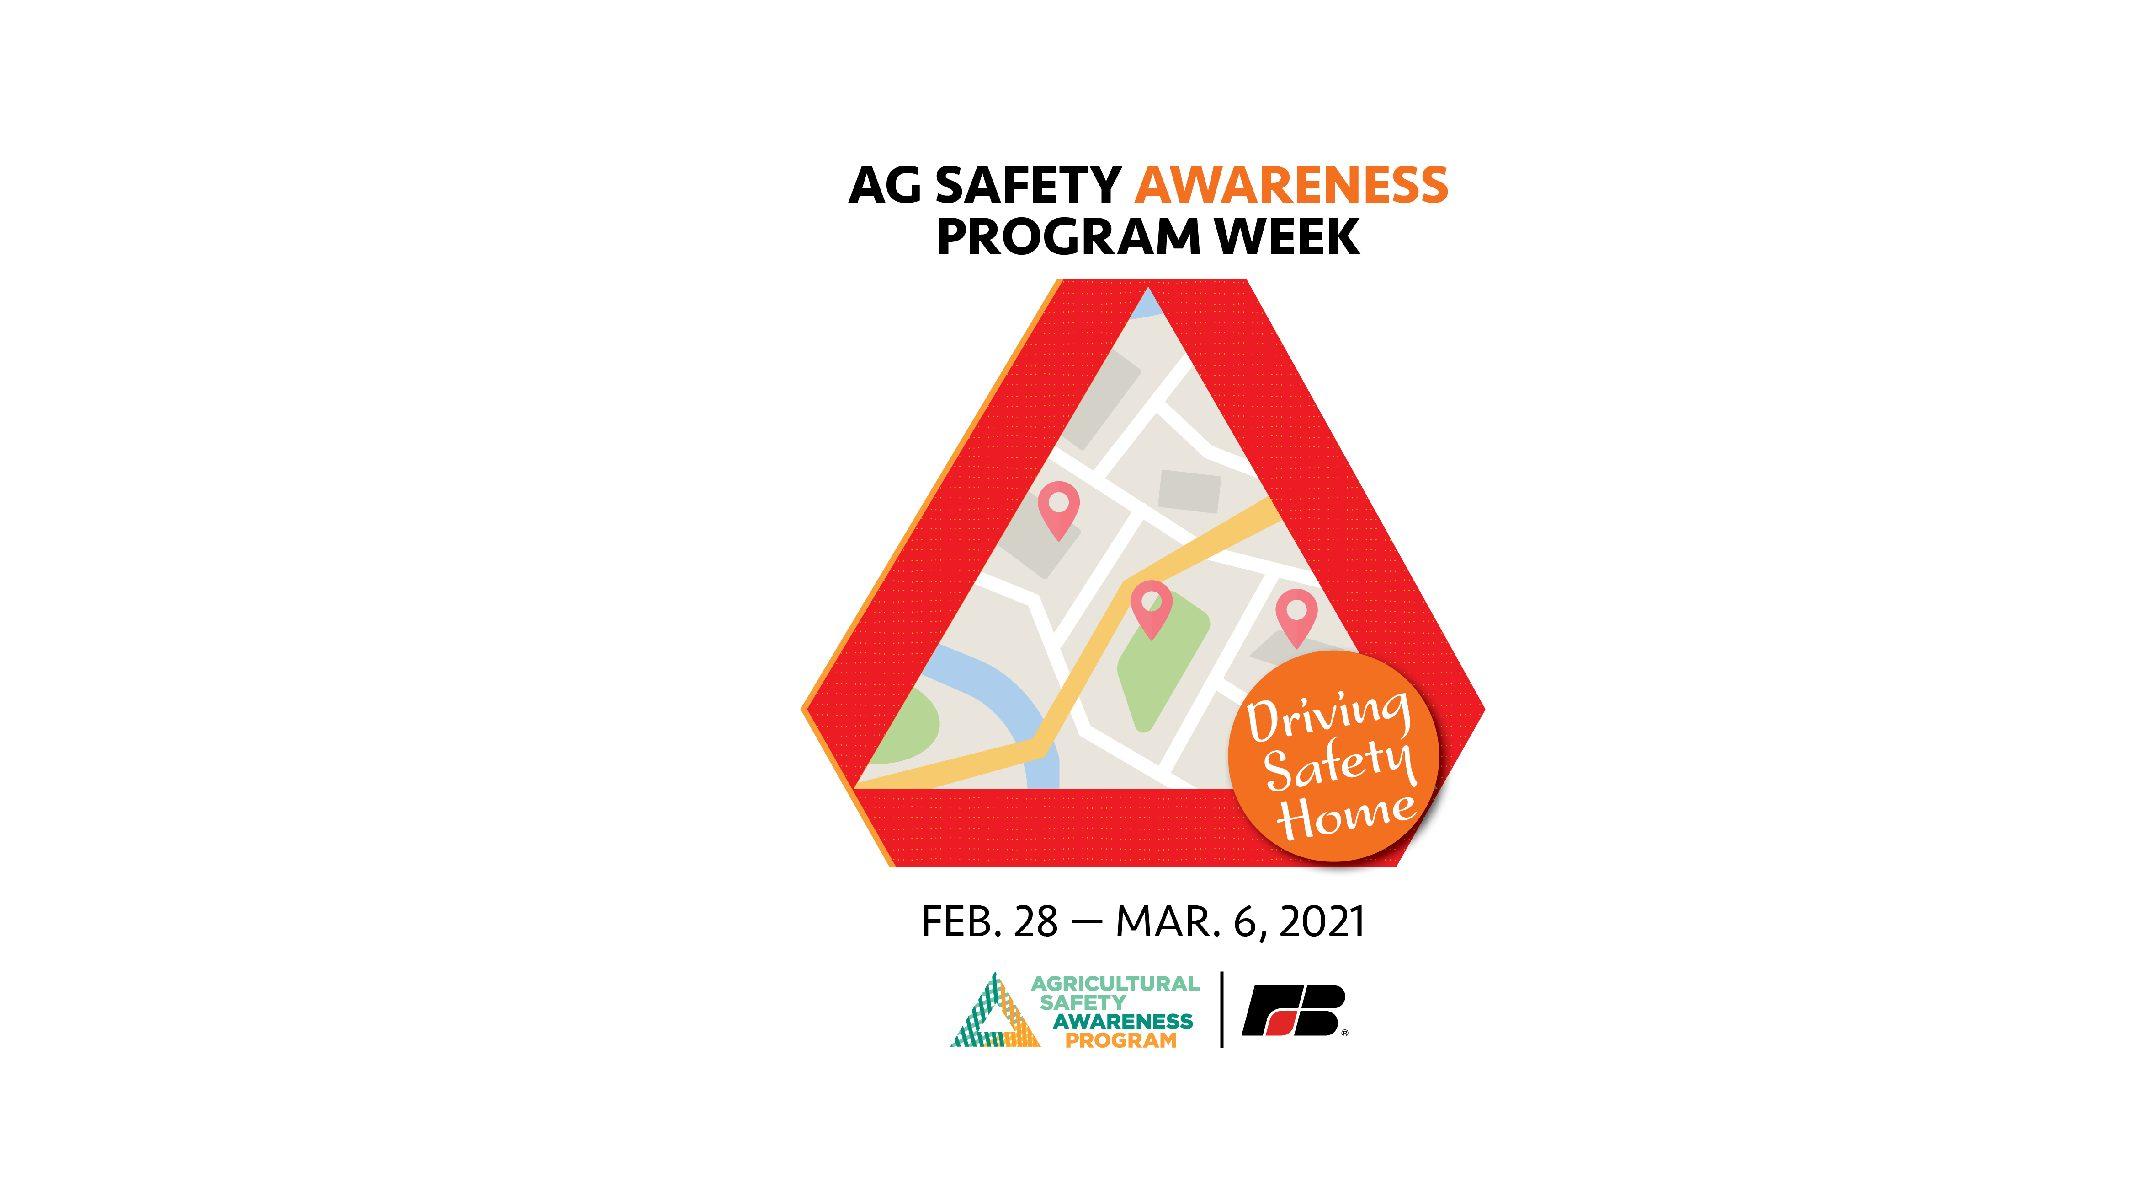 Agricultural Safety Awareness Program Week Kicks-off Next Week